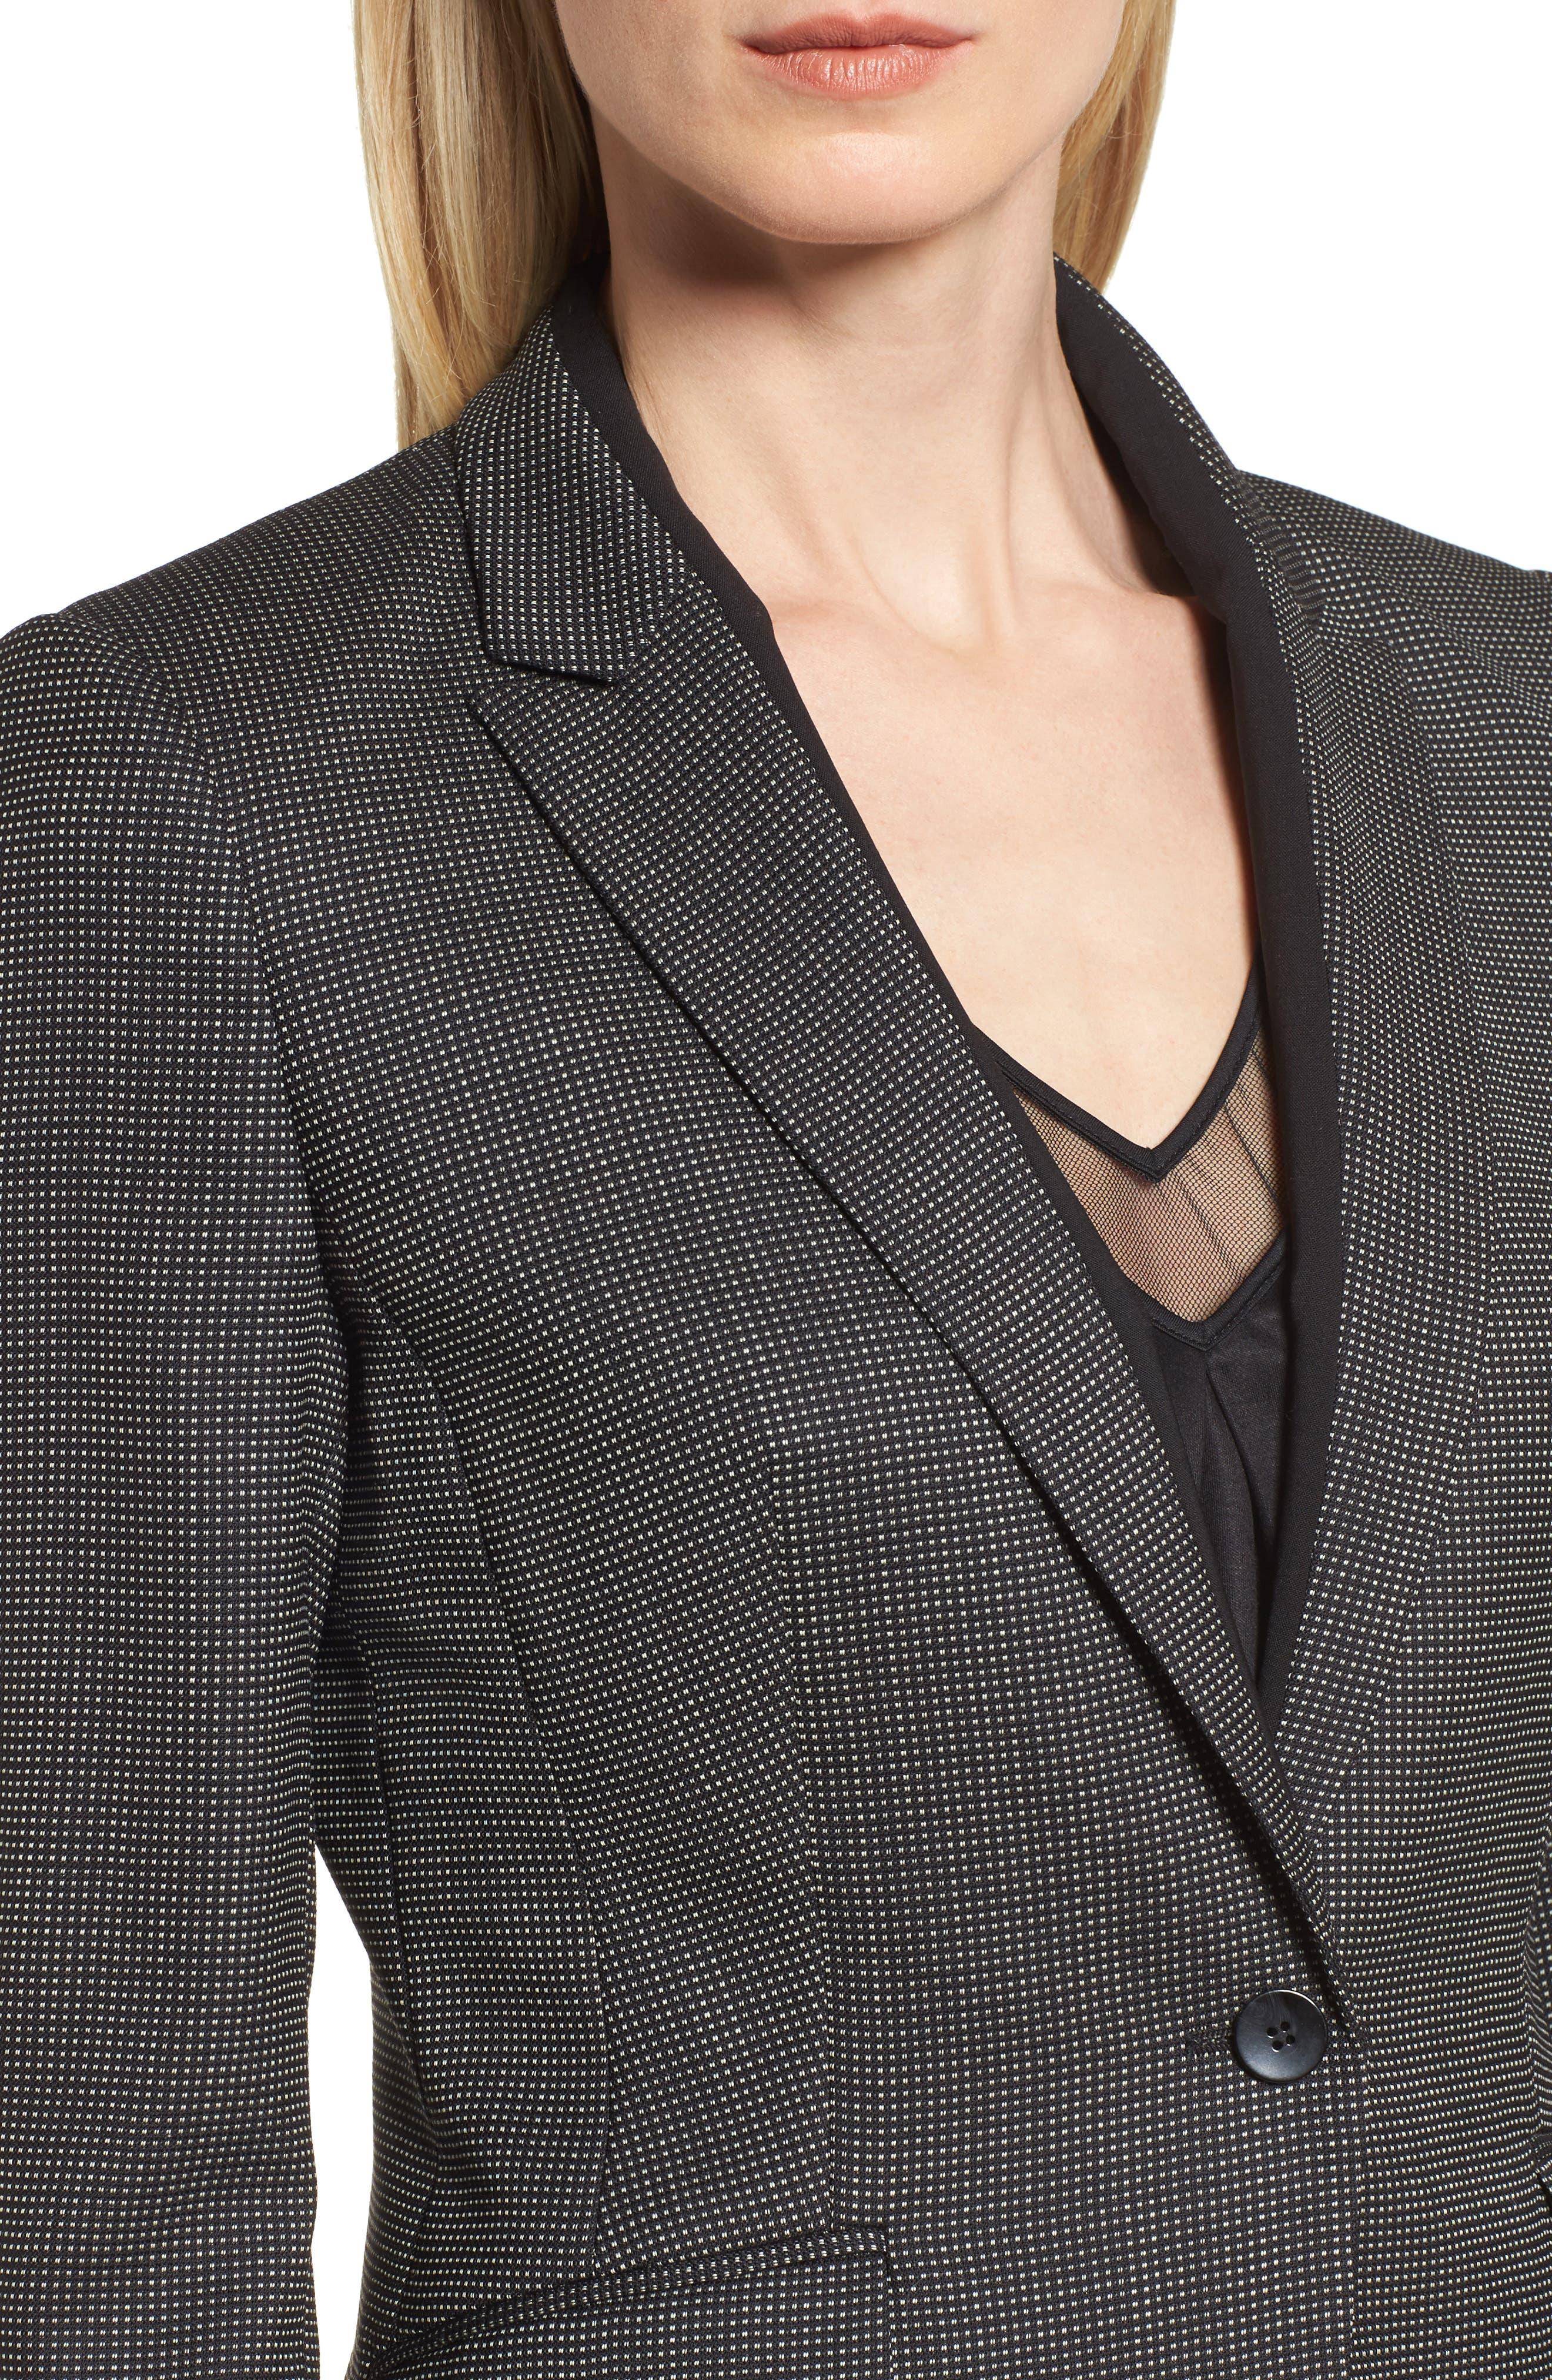 Jeresa Check Stretch Wool Suit Jacket,                             Alternate thumbnail 4, color,                             Black Fantasy